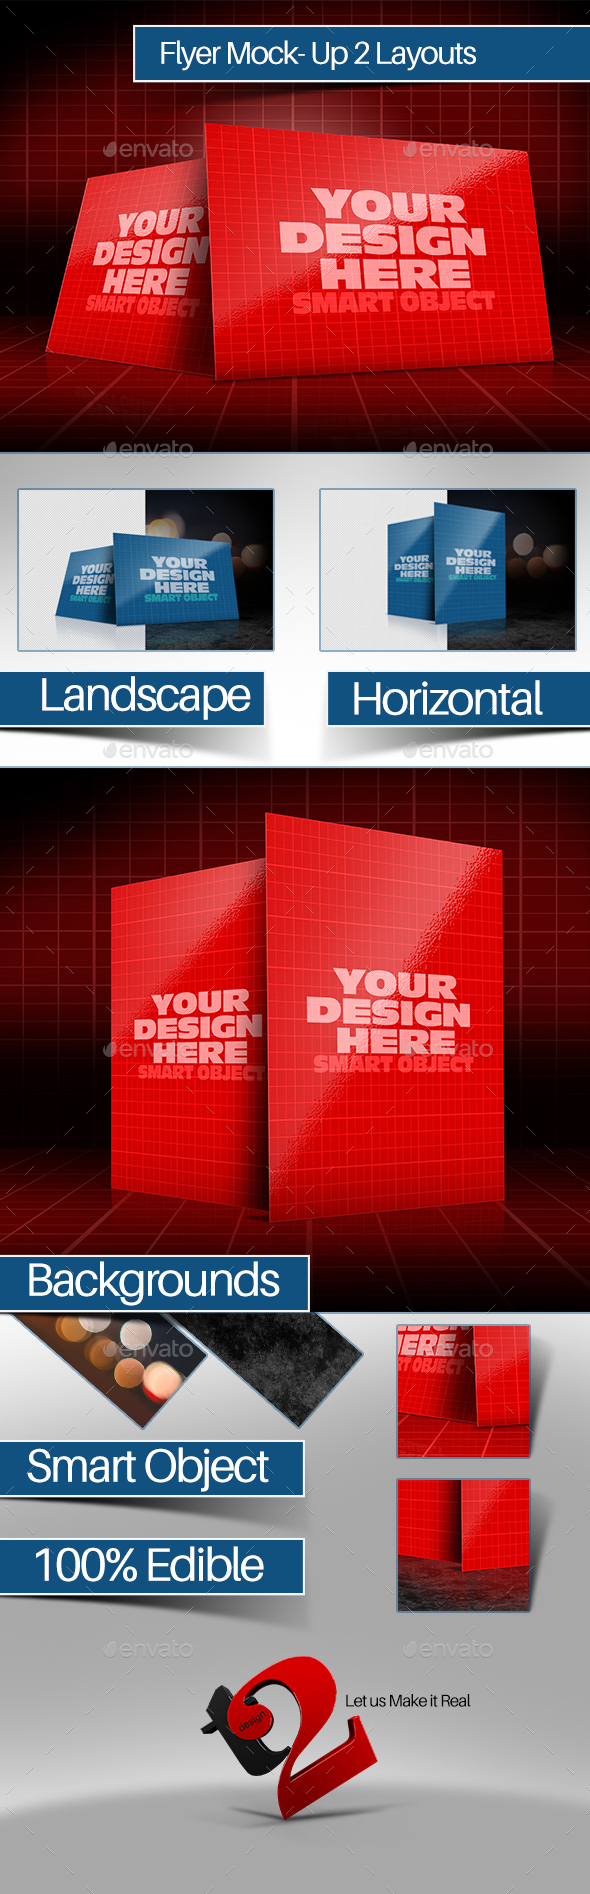 Realistic landscape & Horizontal Flyer Mockup - Product Mock-Ups Graphics